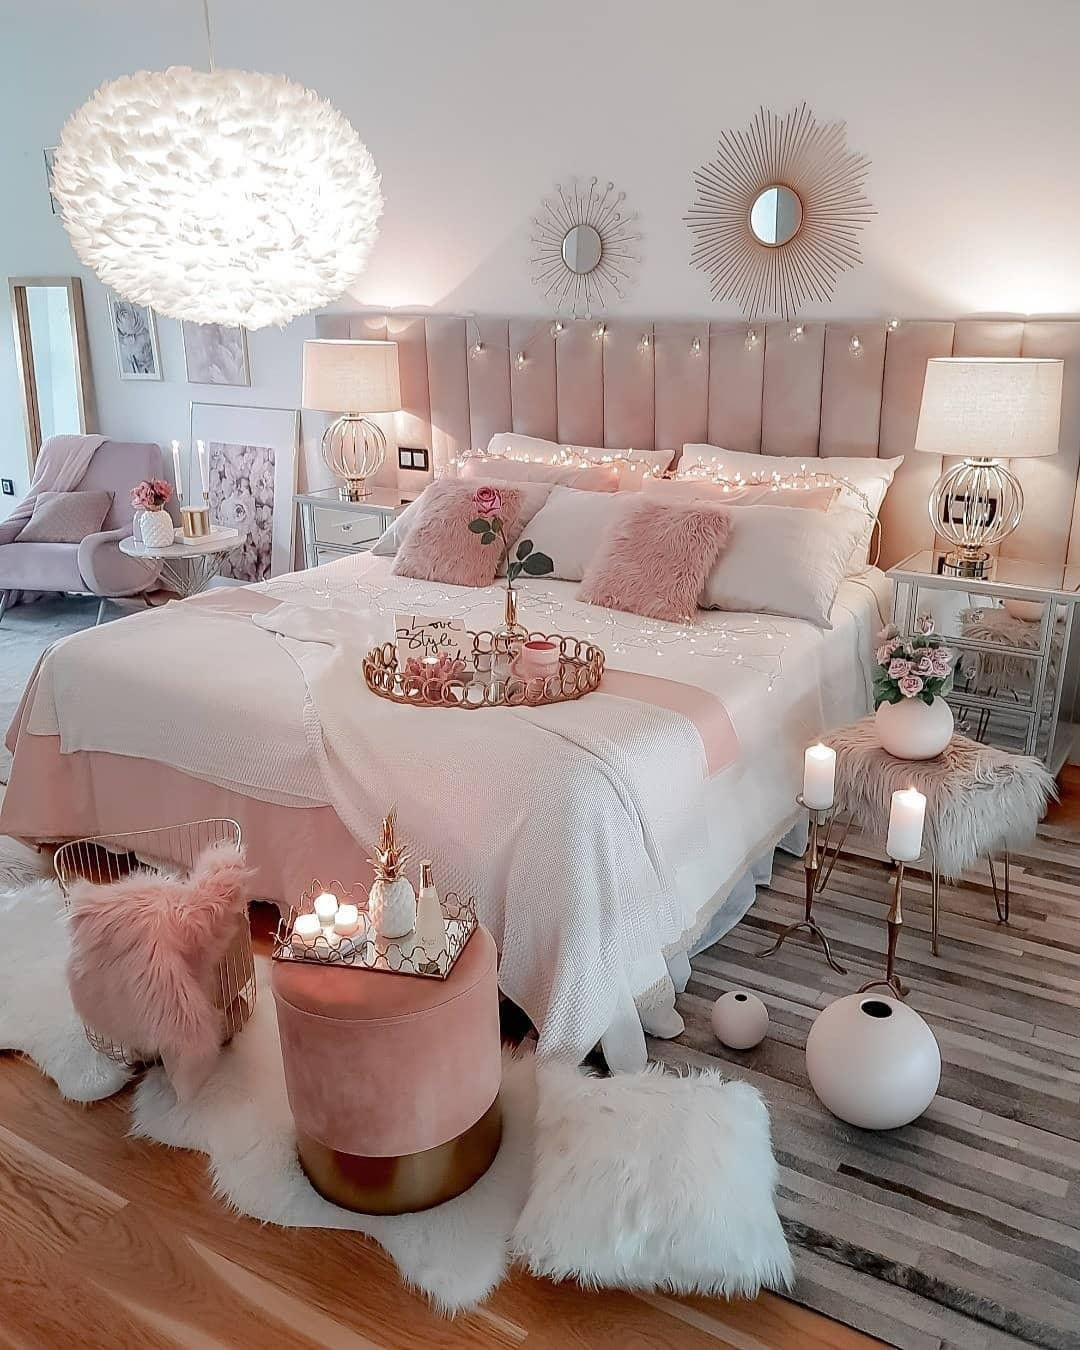 Deco Chambre Fille Ado ream bedroom ?⠀⠀⠀⠀⠀⠀⠀⠀⠀ ?️ retrouvez notre